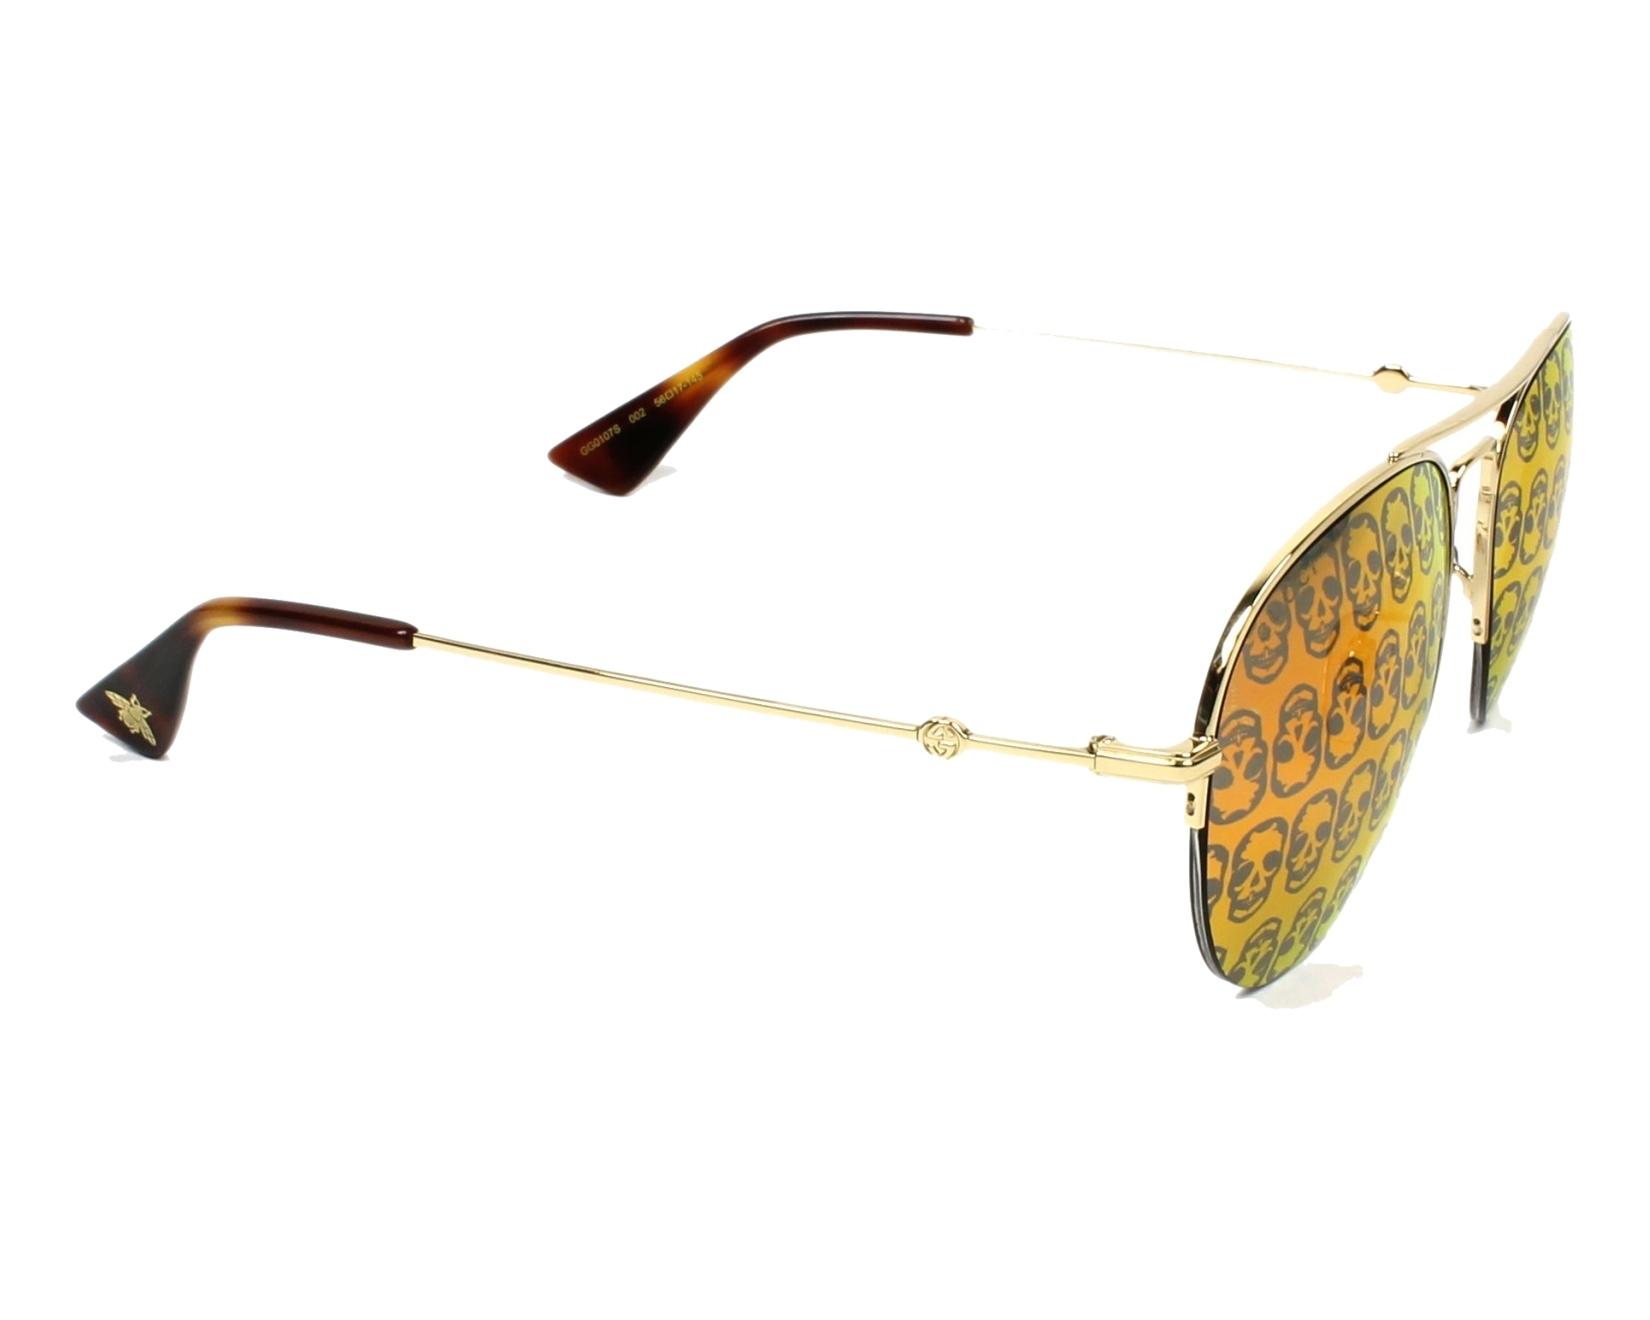 bdb86642ed90 Sunglasses Gucci GG-0107-S 002 - Gold side view